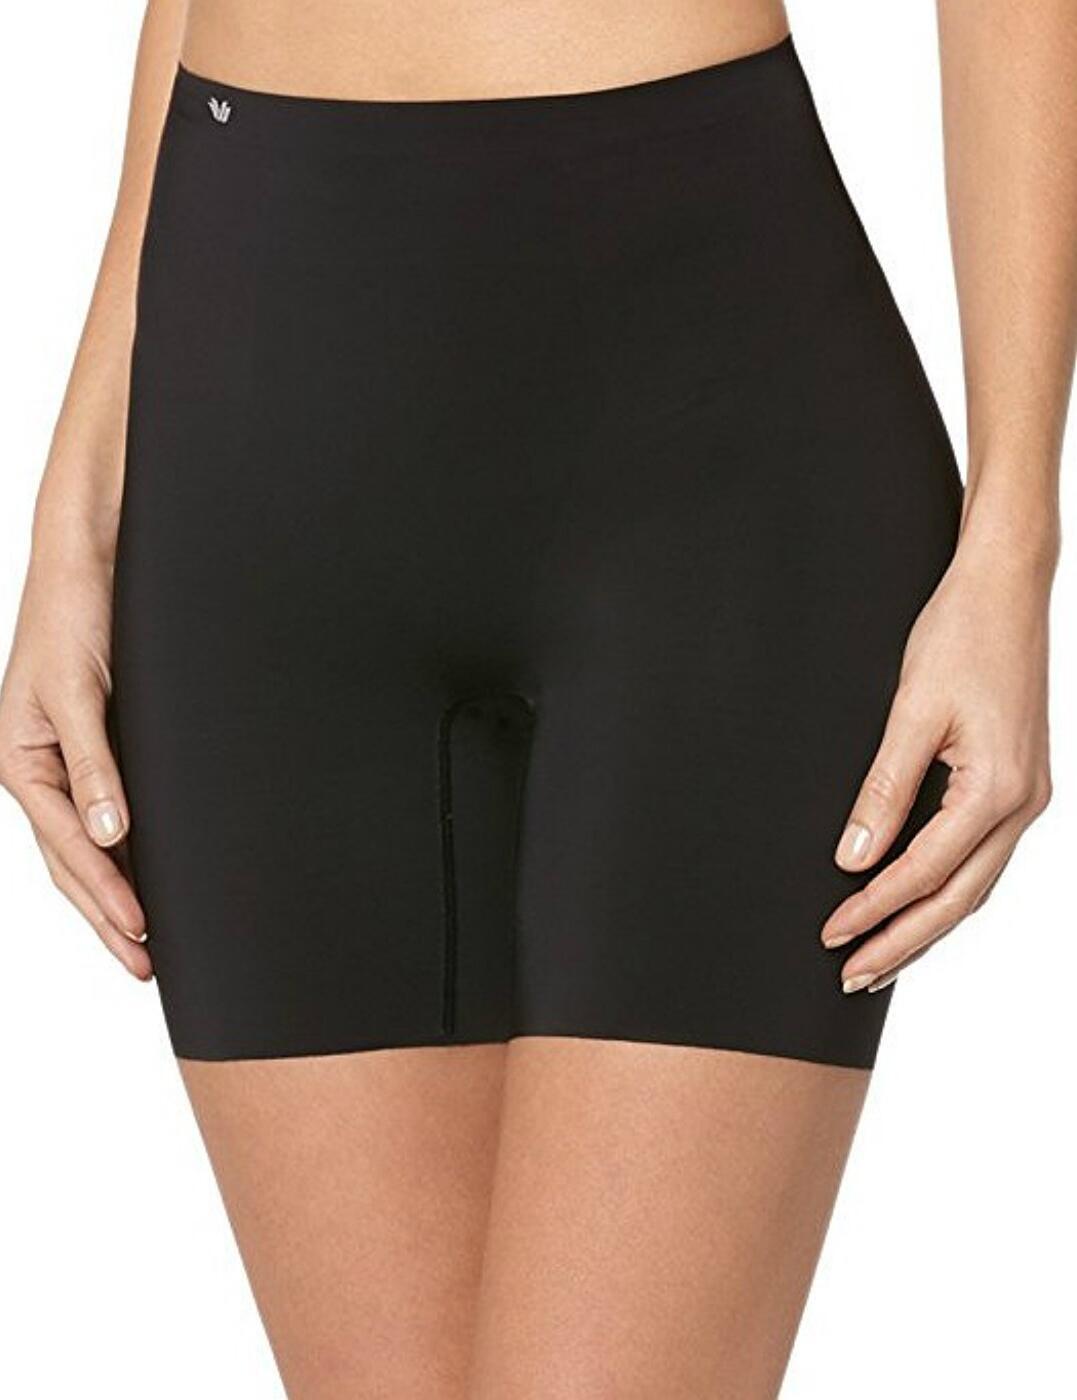 Wacoal-Beauty-Secret-Lift-Up-Shaping-Slimming-Panty-GRA541-Wacoal-Shapewear Indexbild 4